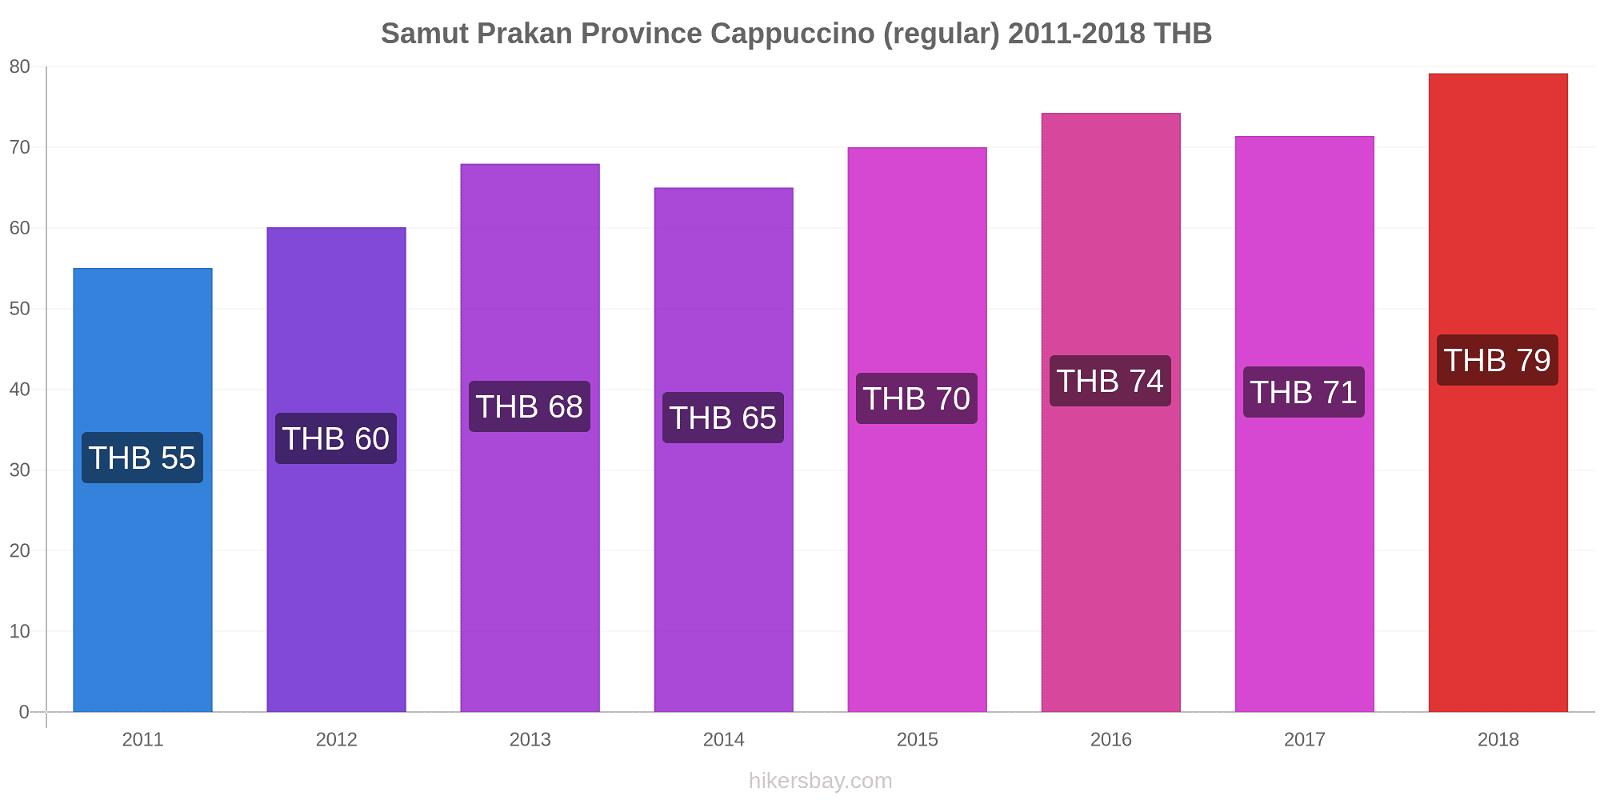 Samut Prakan Province price changes Cappuccino (regular) hikersbay.com